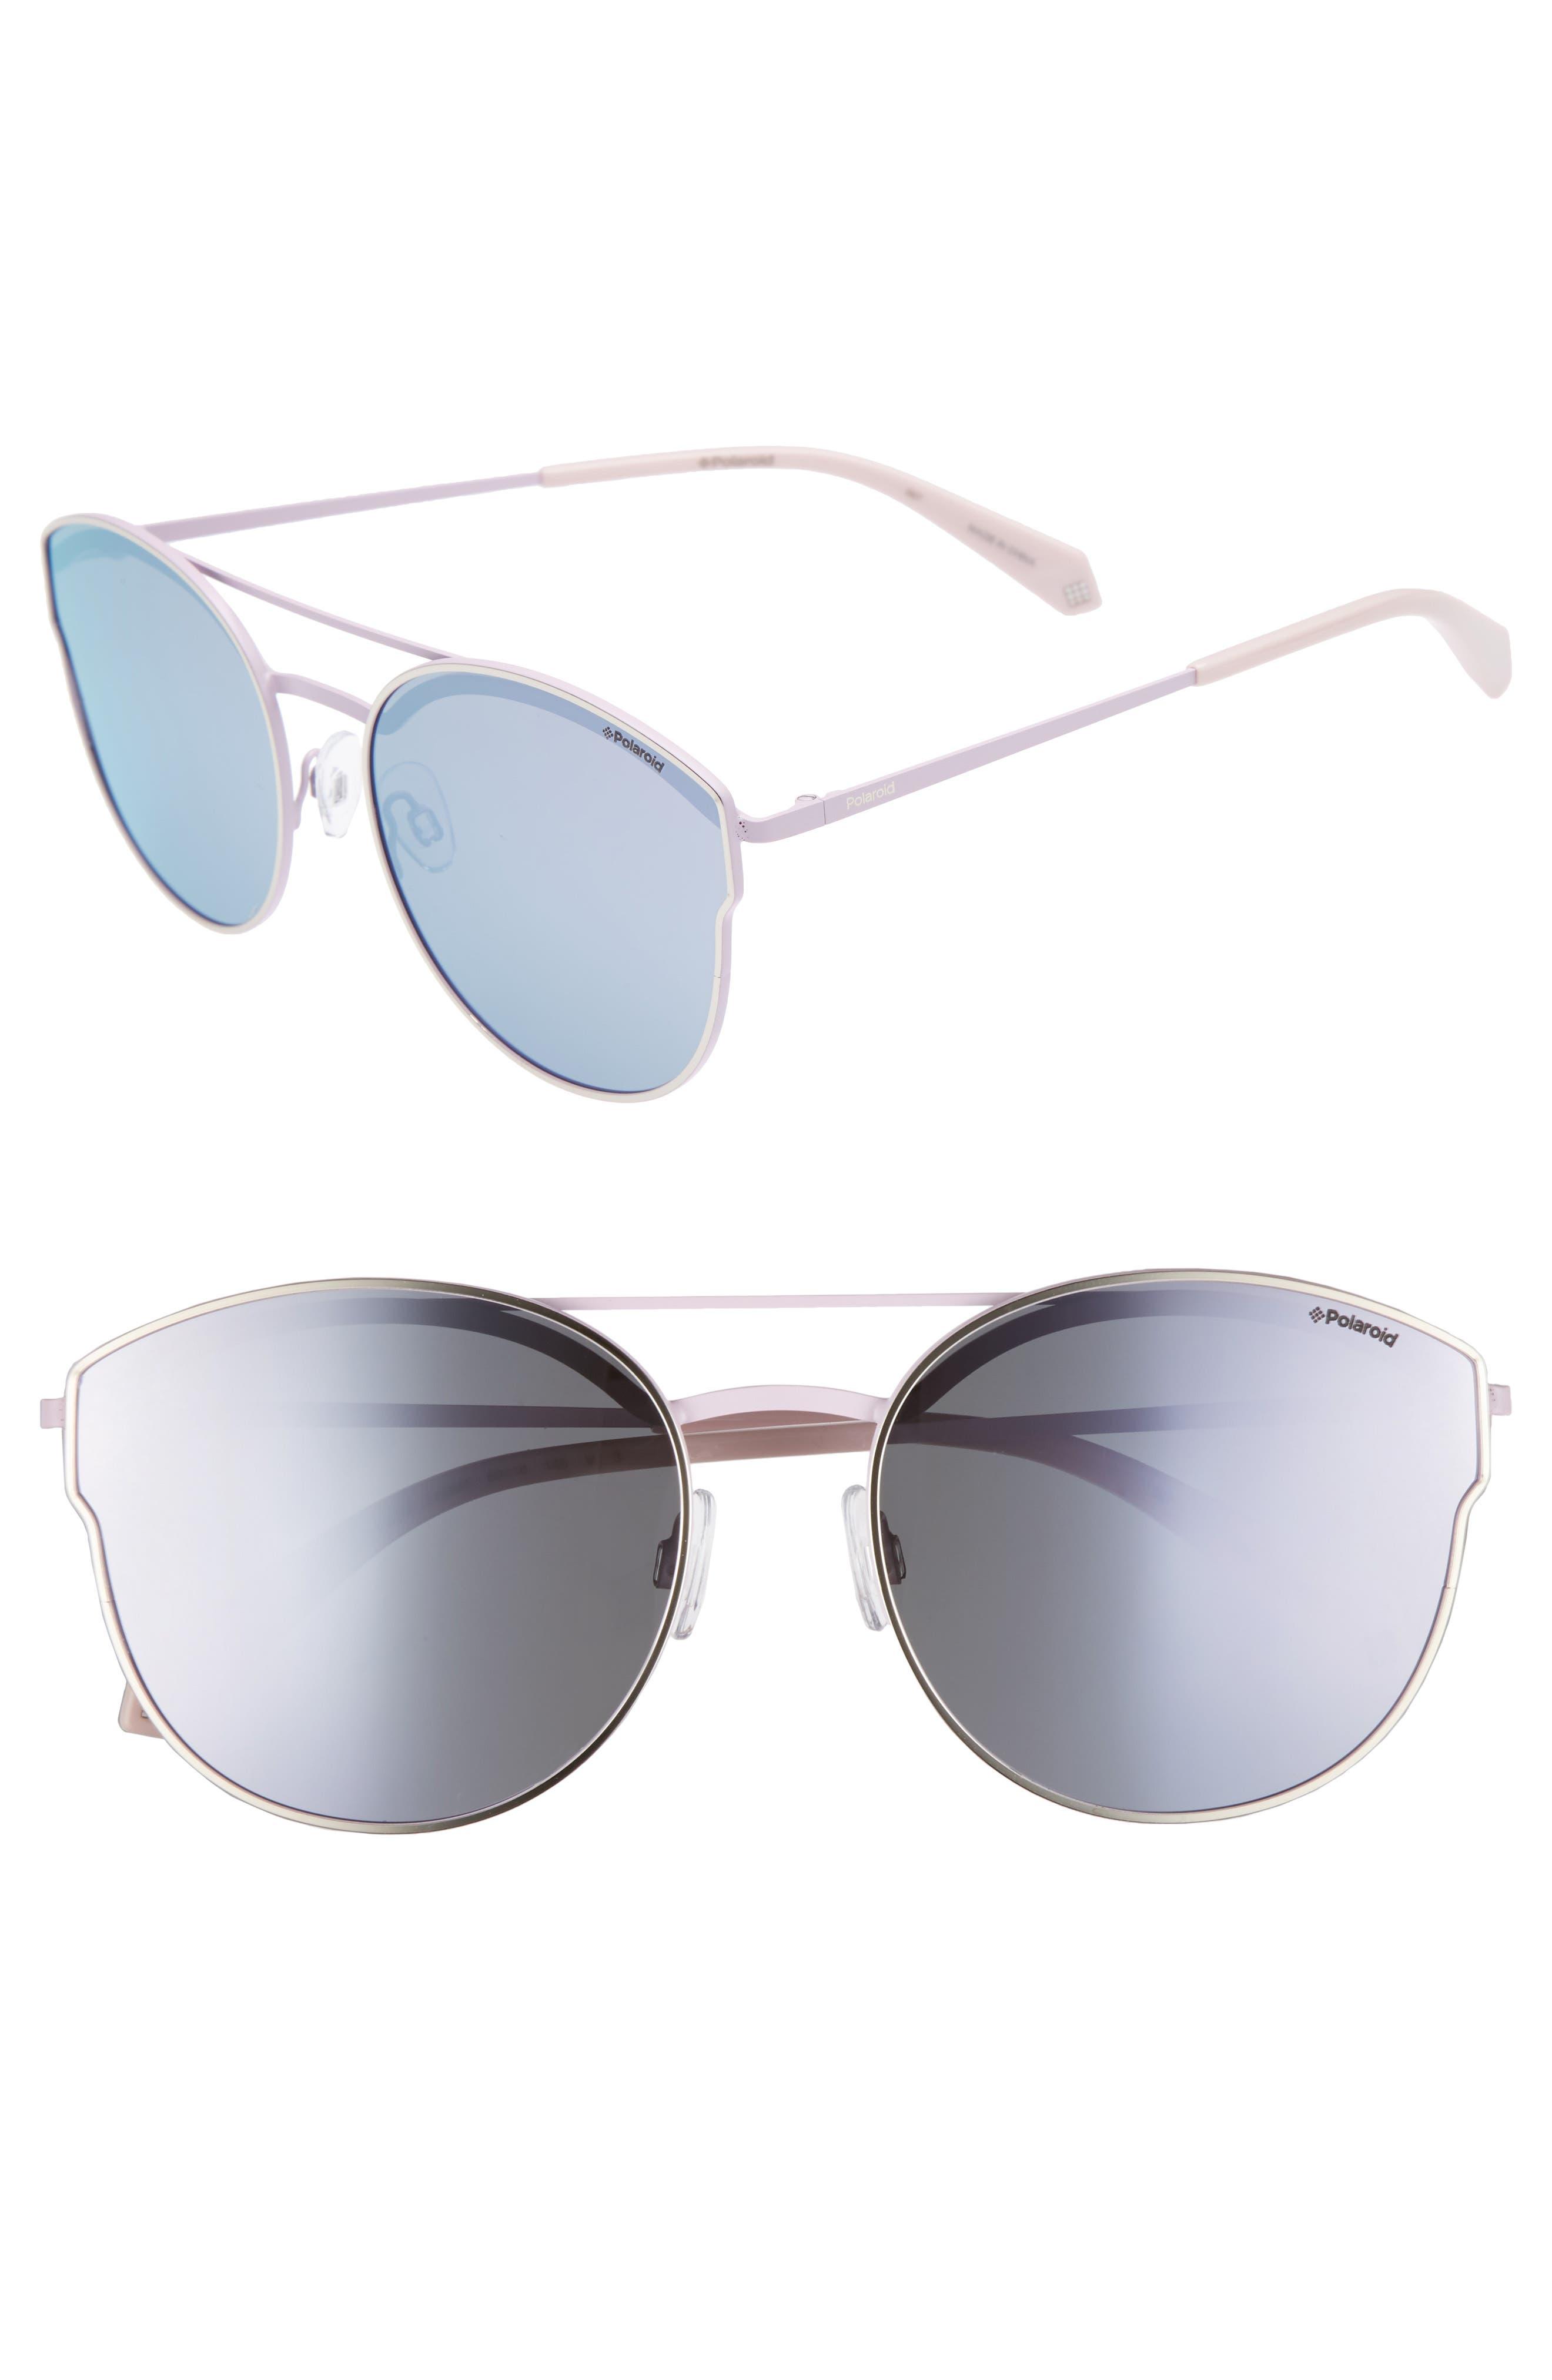 Main Image - Polaroid 60mm Polarized Round Aviator Sunglasses